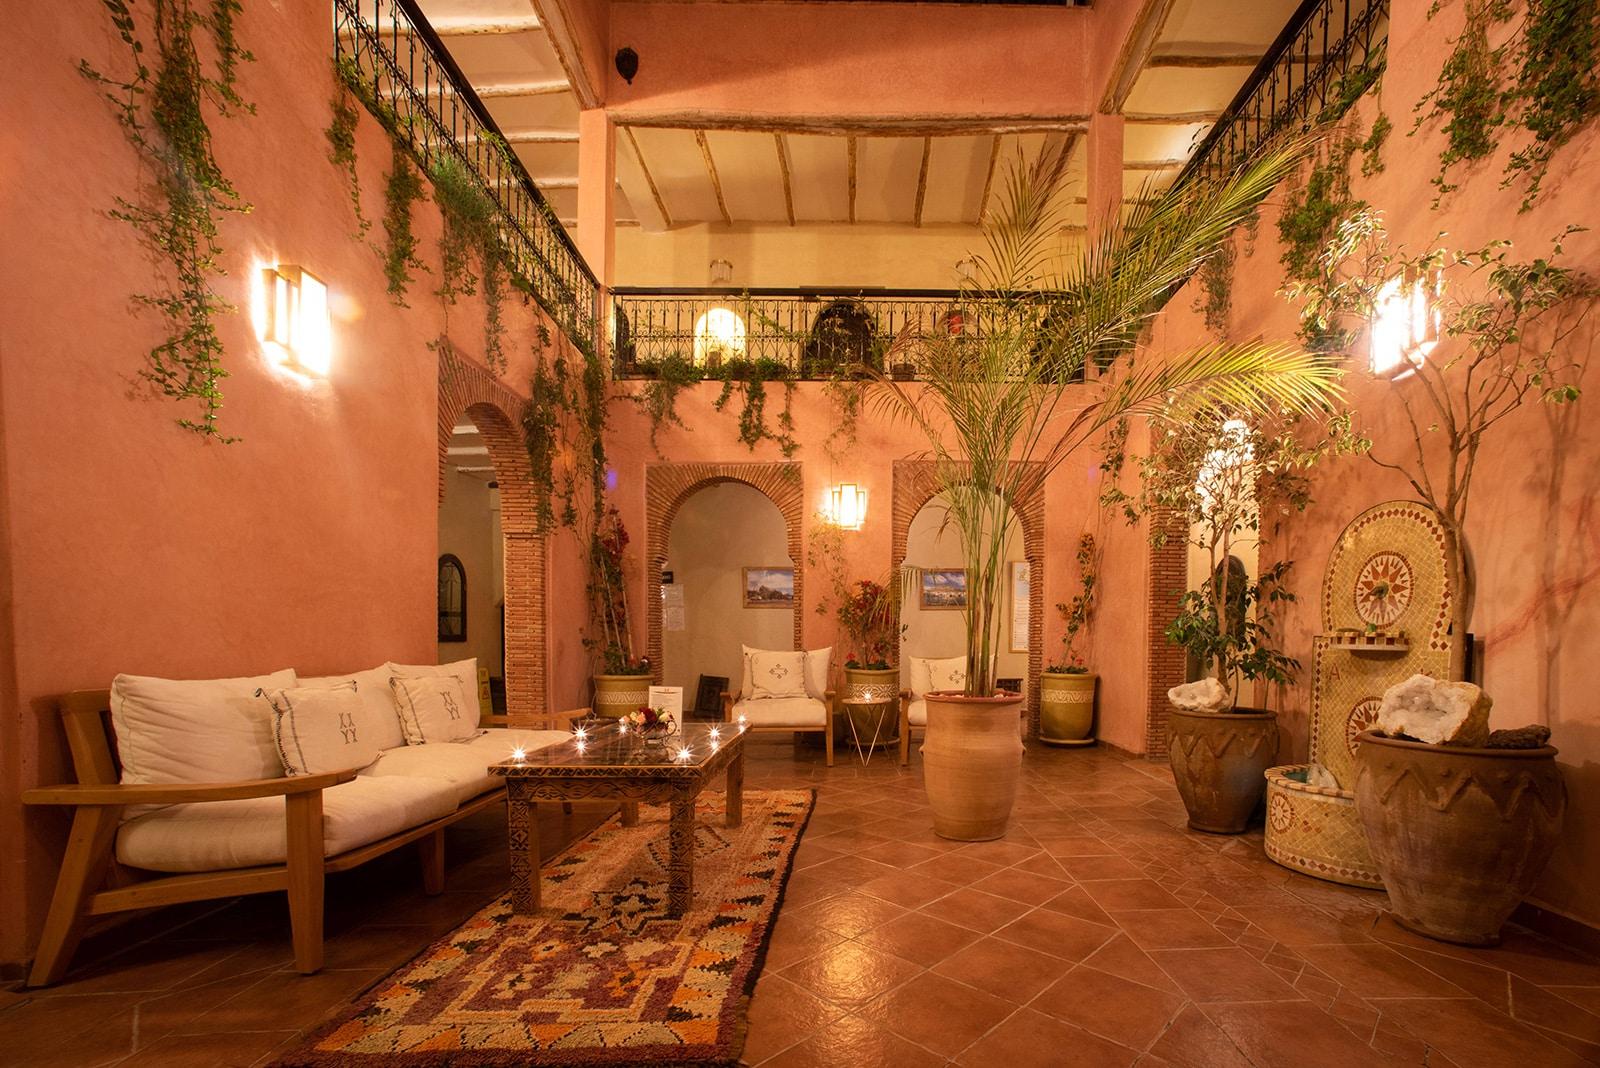 24 Charmant Salon De Jardin Marocain | Salon Jardin intérieur Salon De Jardin Marocain